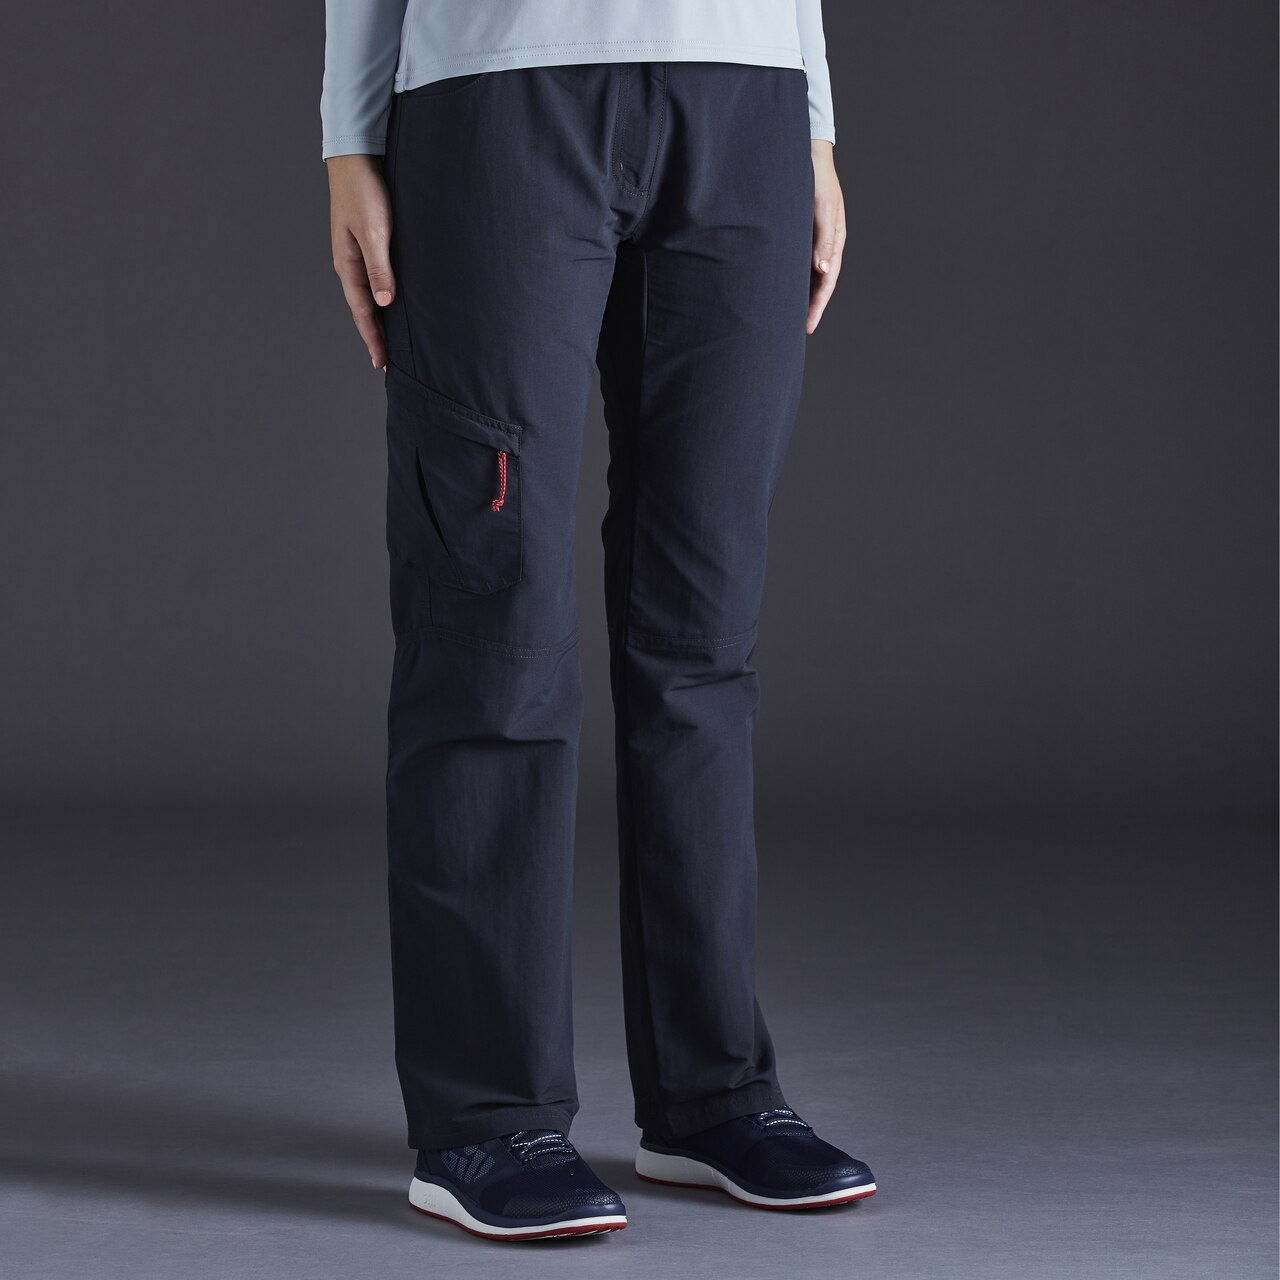 Women's UV Tec Trousers - UV014W-GRA01-MODEL-6.jpg